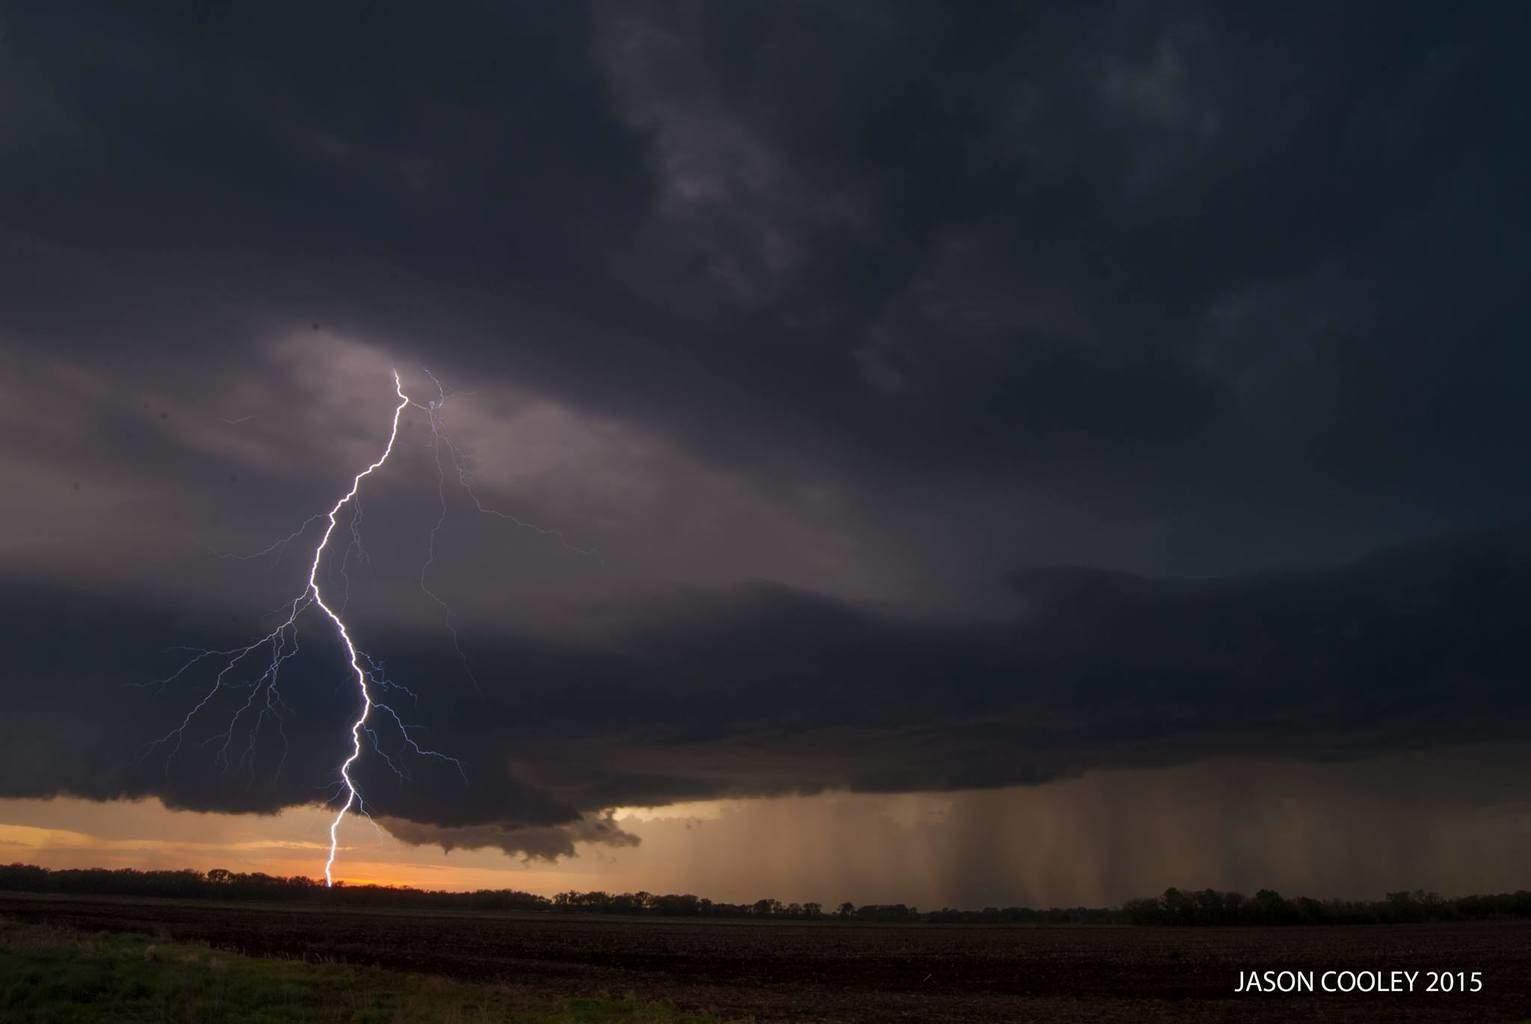 Firth, Nebraska around 8:15pm this evening!